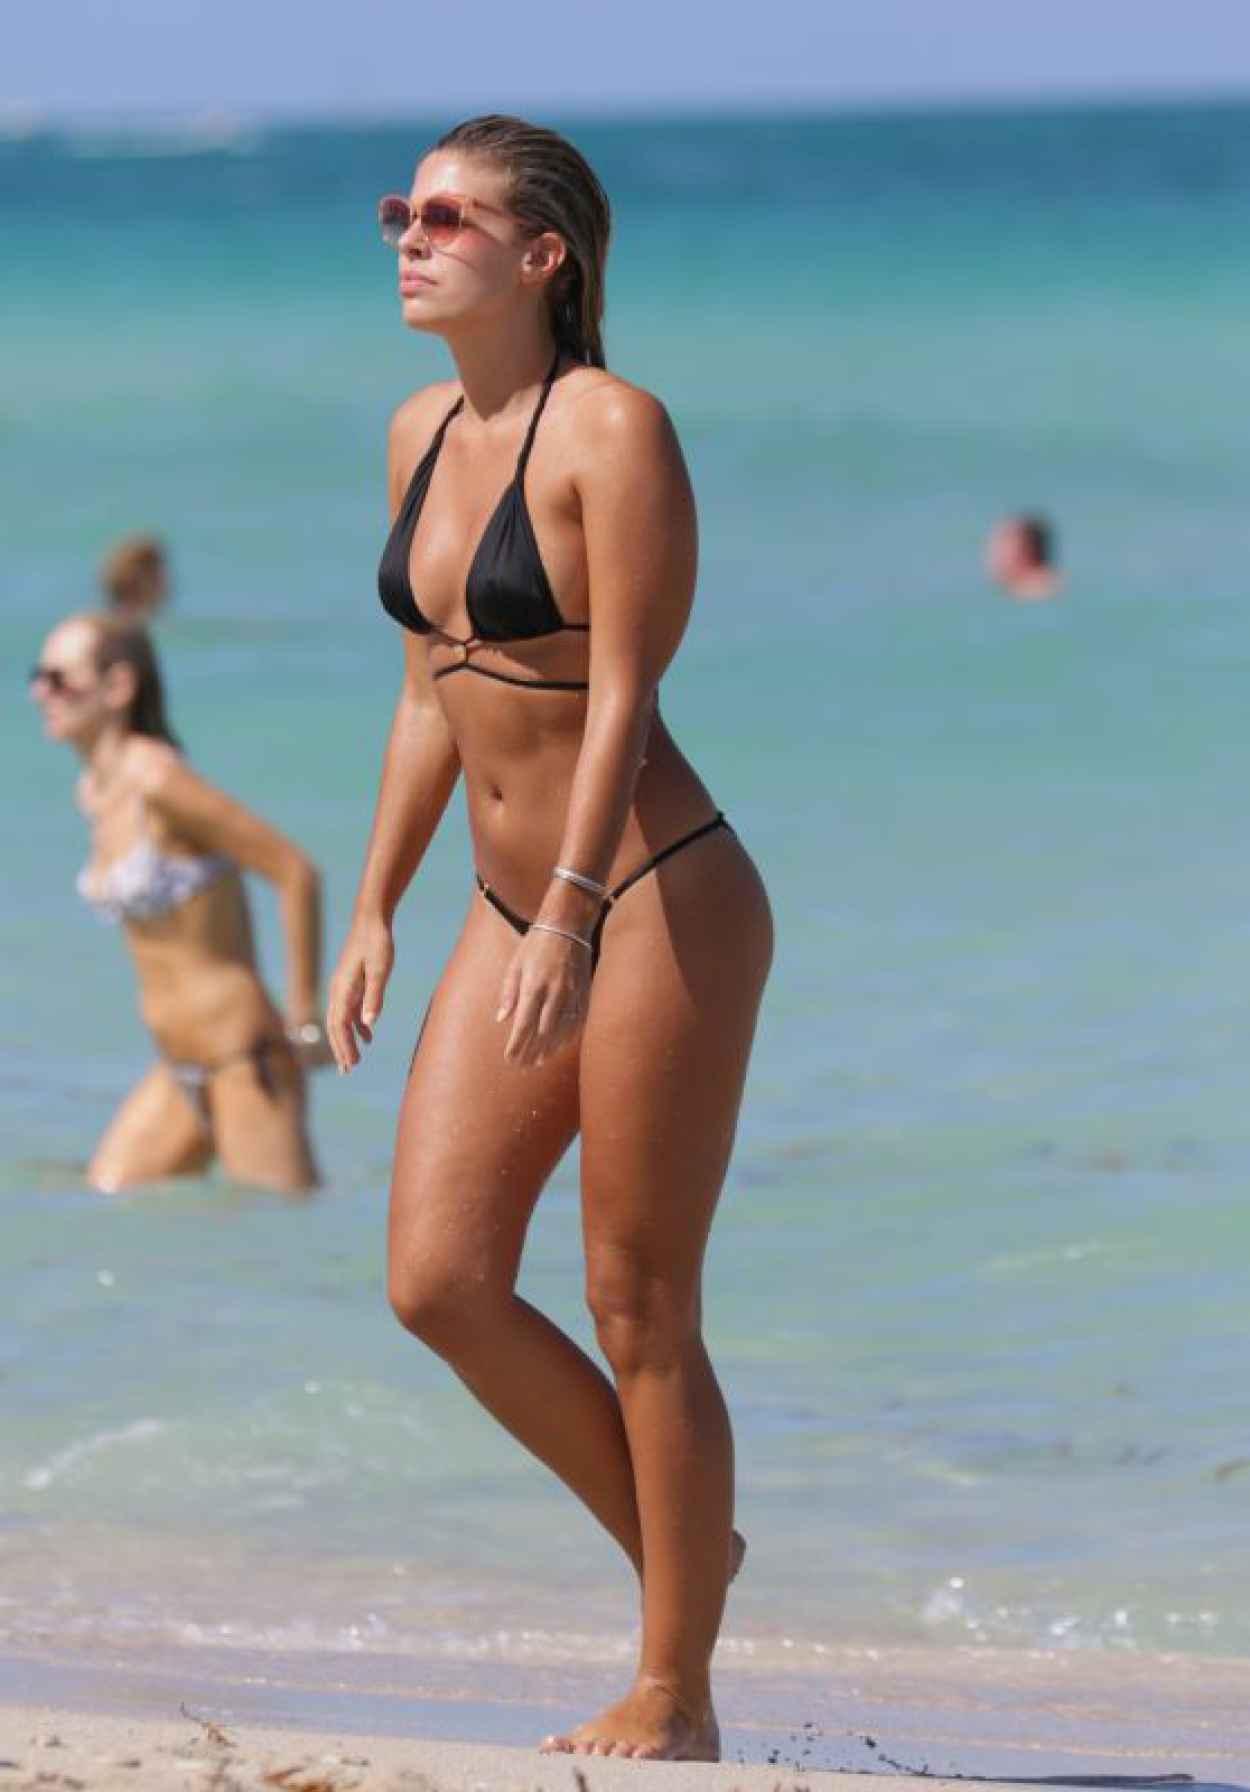 Natasha Oakley in Black Bikini at a Beach in Miami, May 2015-1